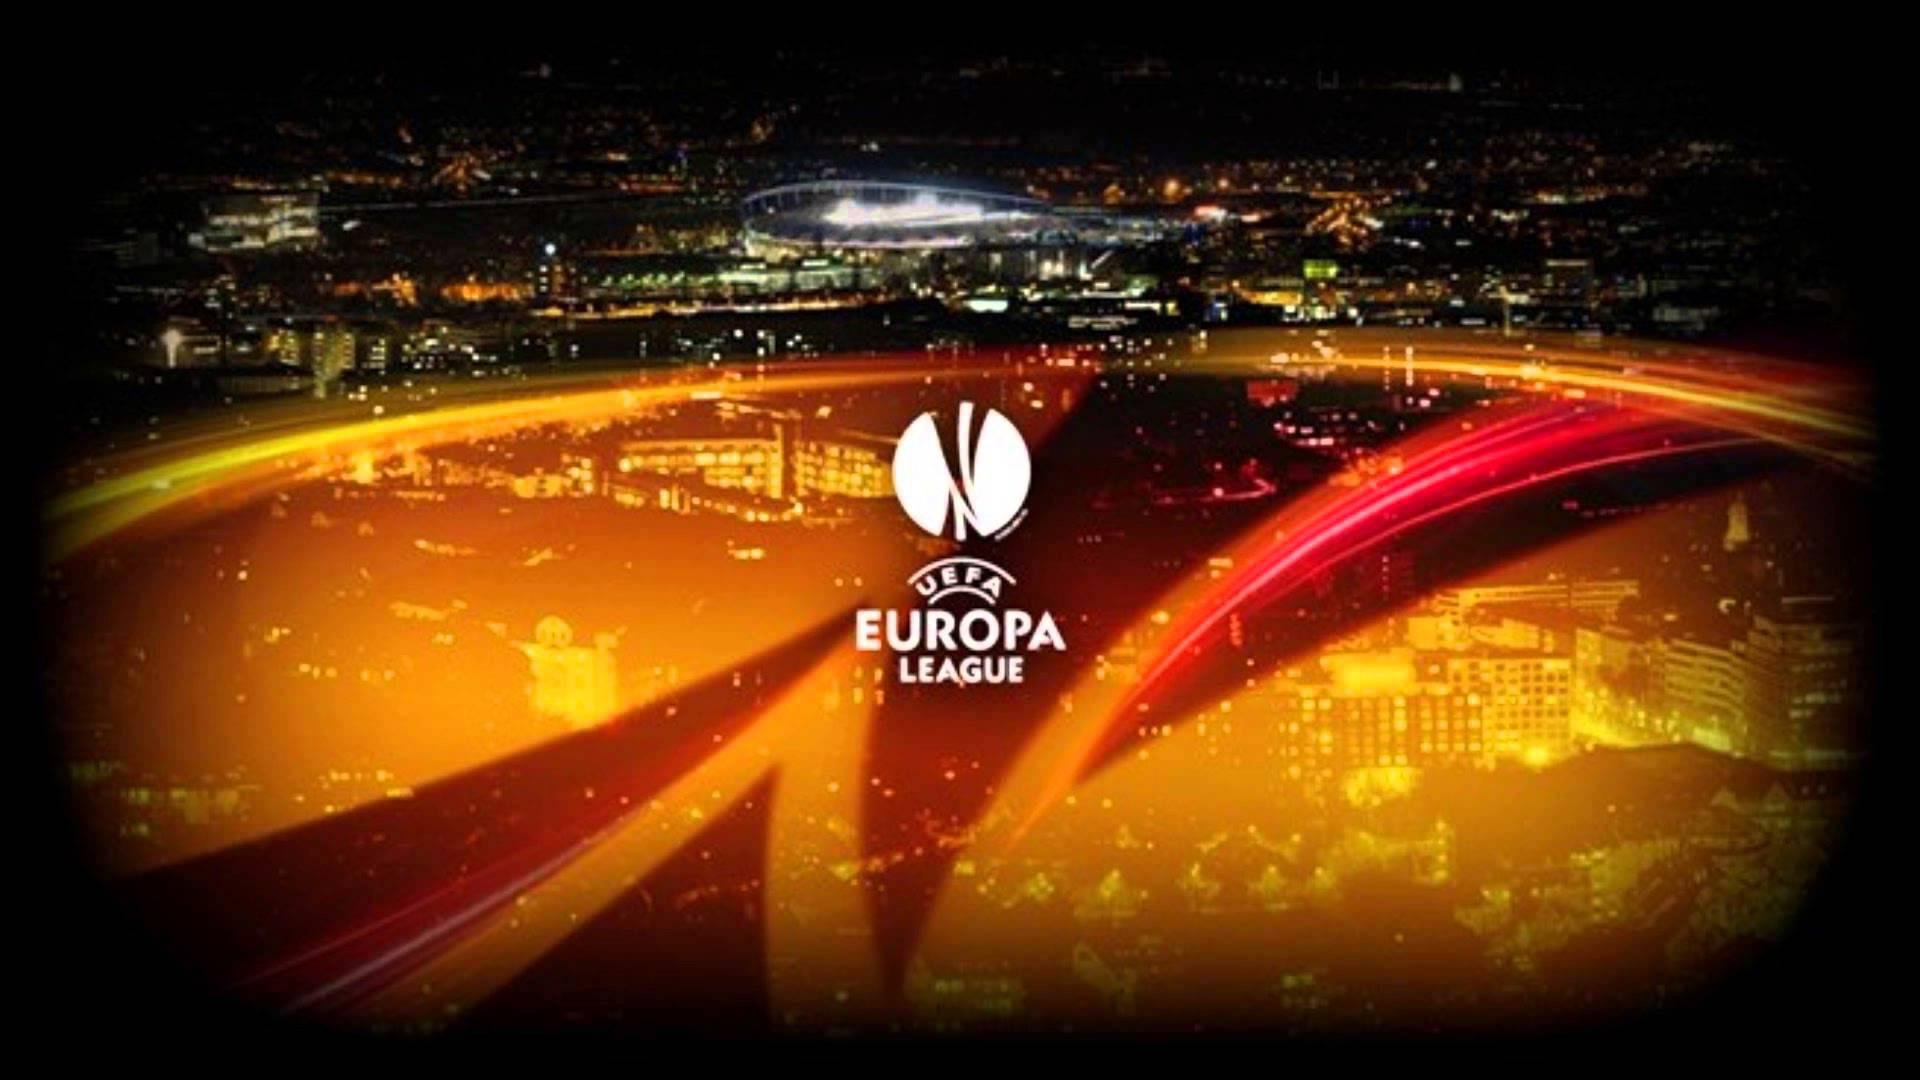 Uefa Europa League Wallpapers Top Free Uefa Europa League Backgrounds Wallpaperaccess